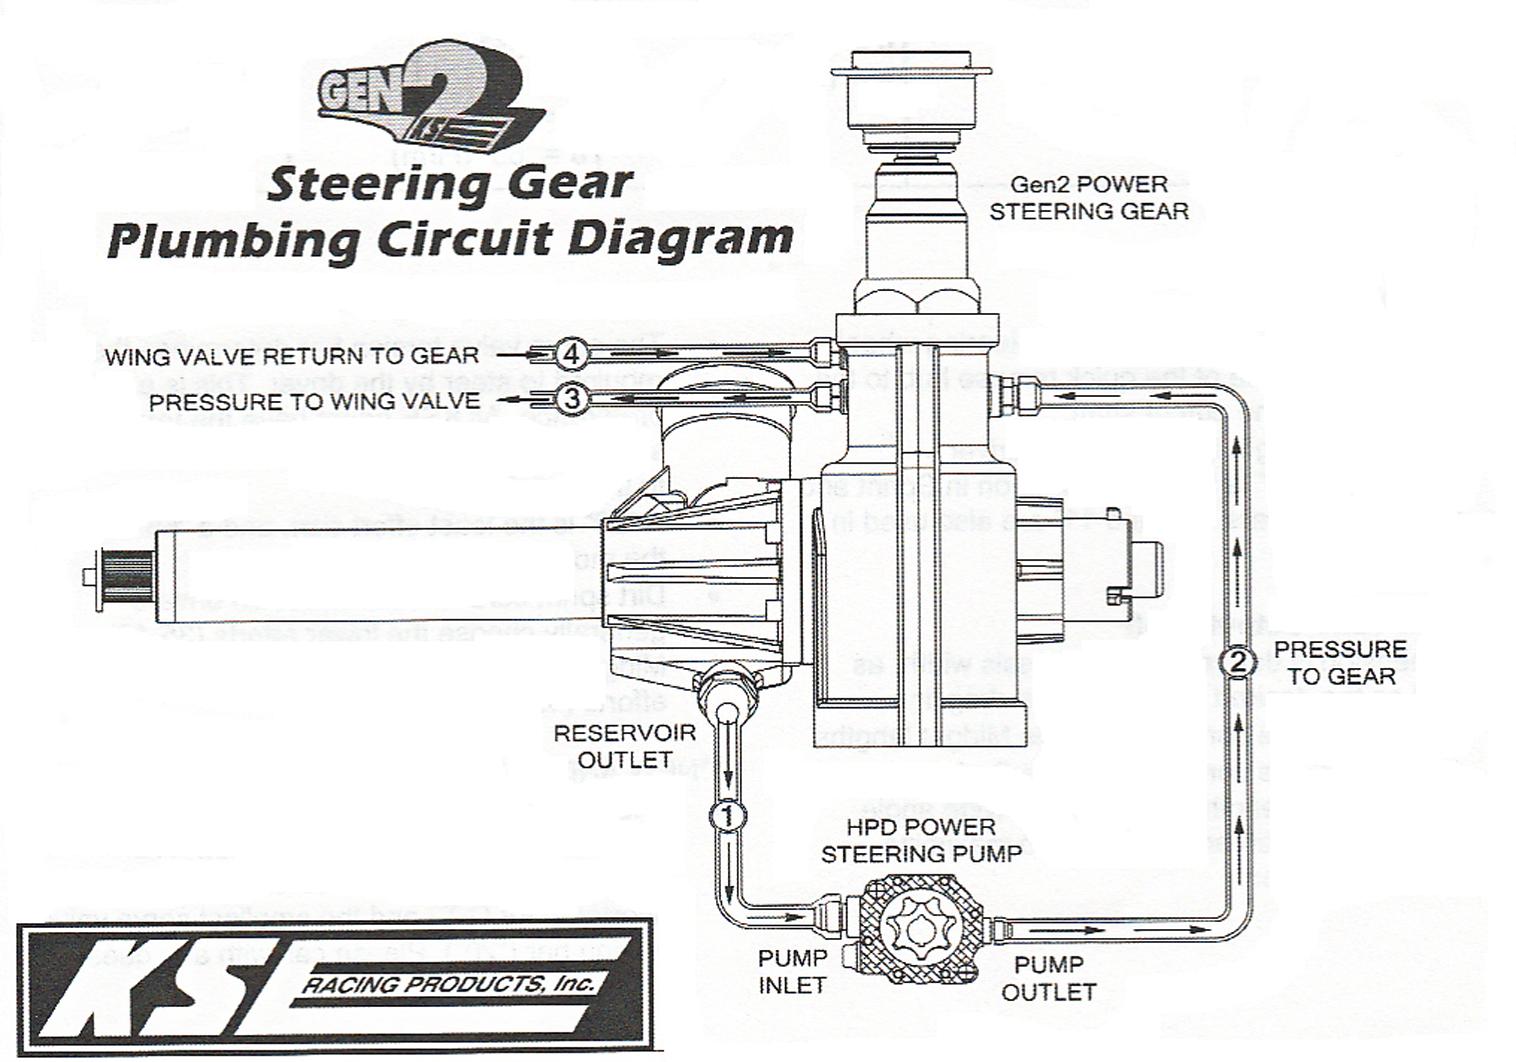 Gen2 Plumbing Diagram Sprint Car Parts